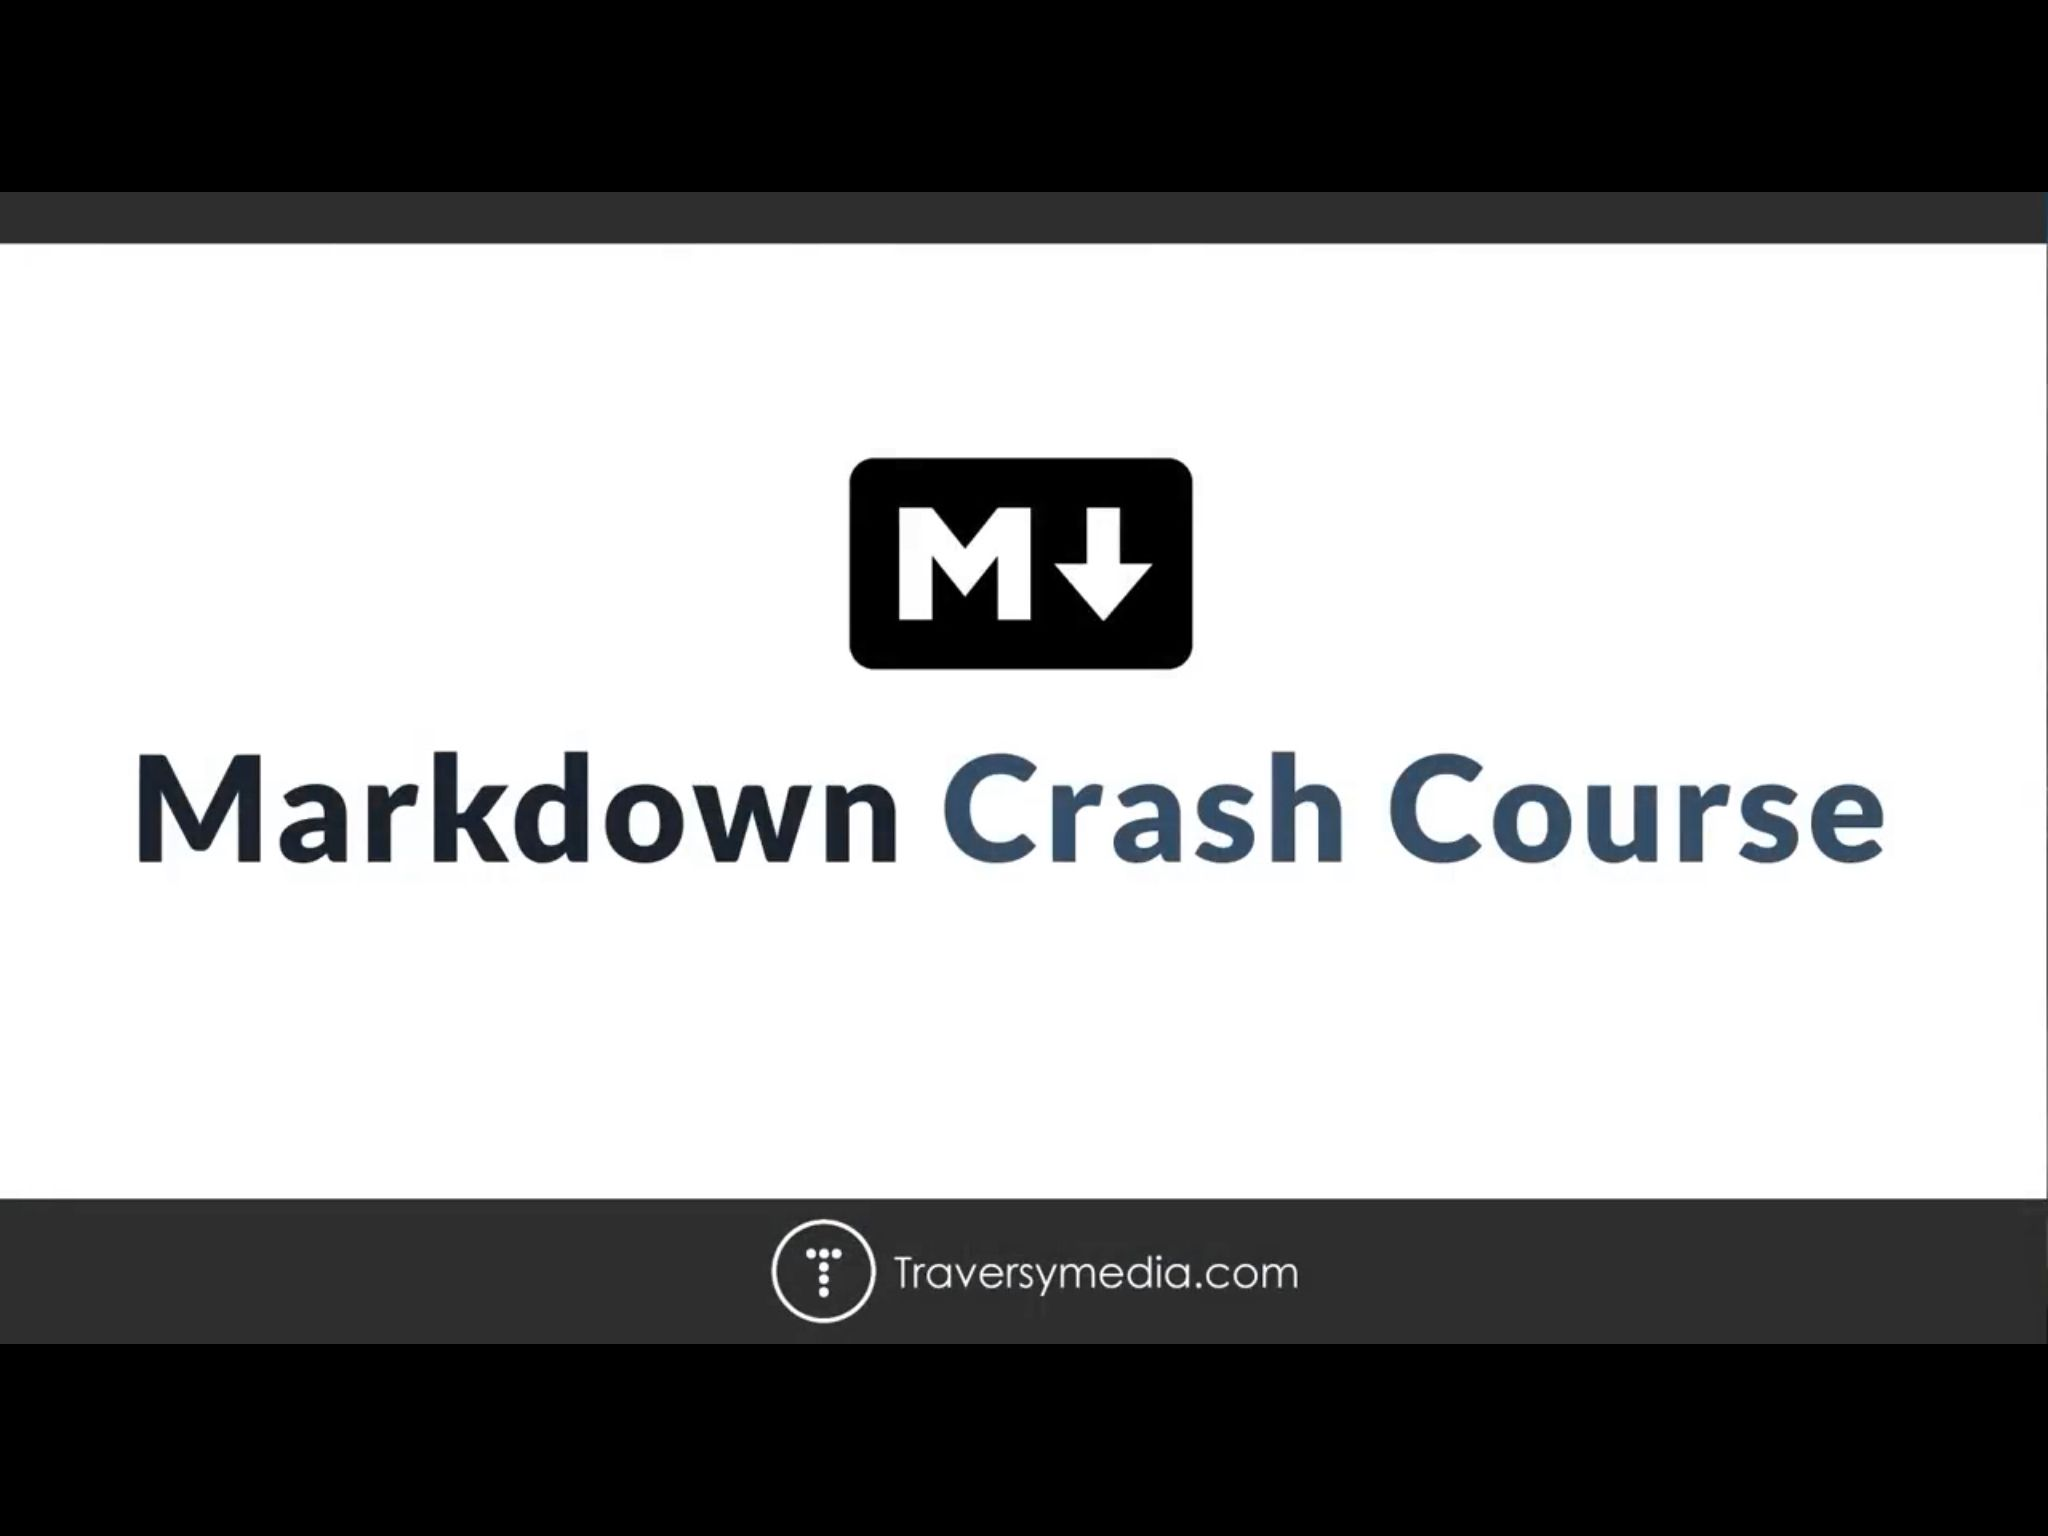 Markdown Crash Course Video by @traversymedia https://youtu.be/HUBNt18RFbo